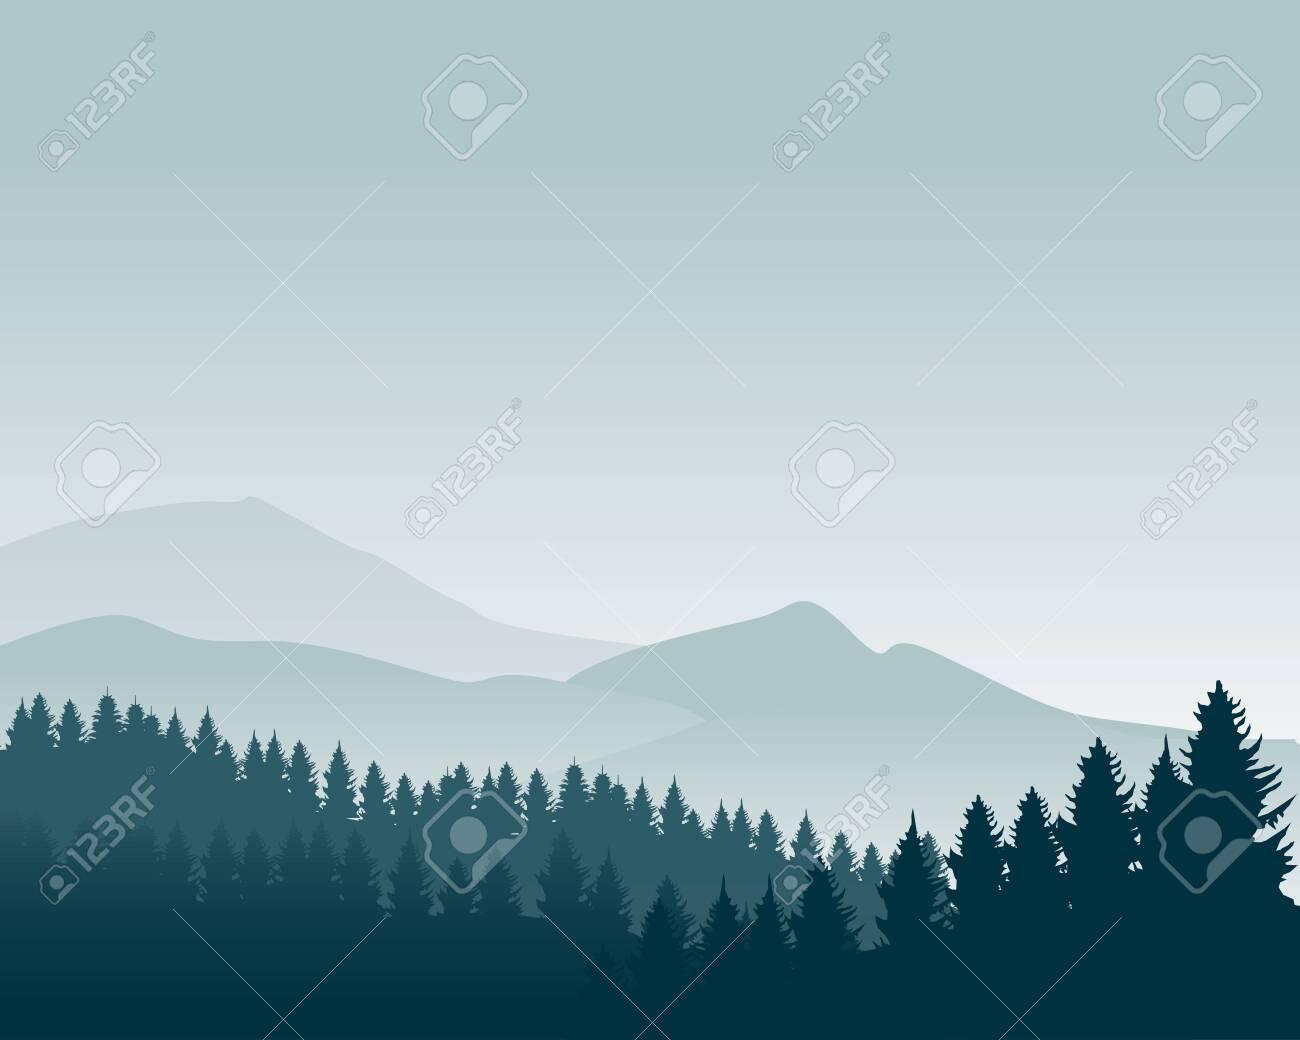 Nature Landscape Silhouette Vector Illustration Mountain